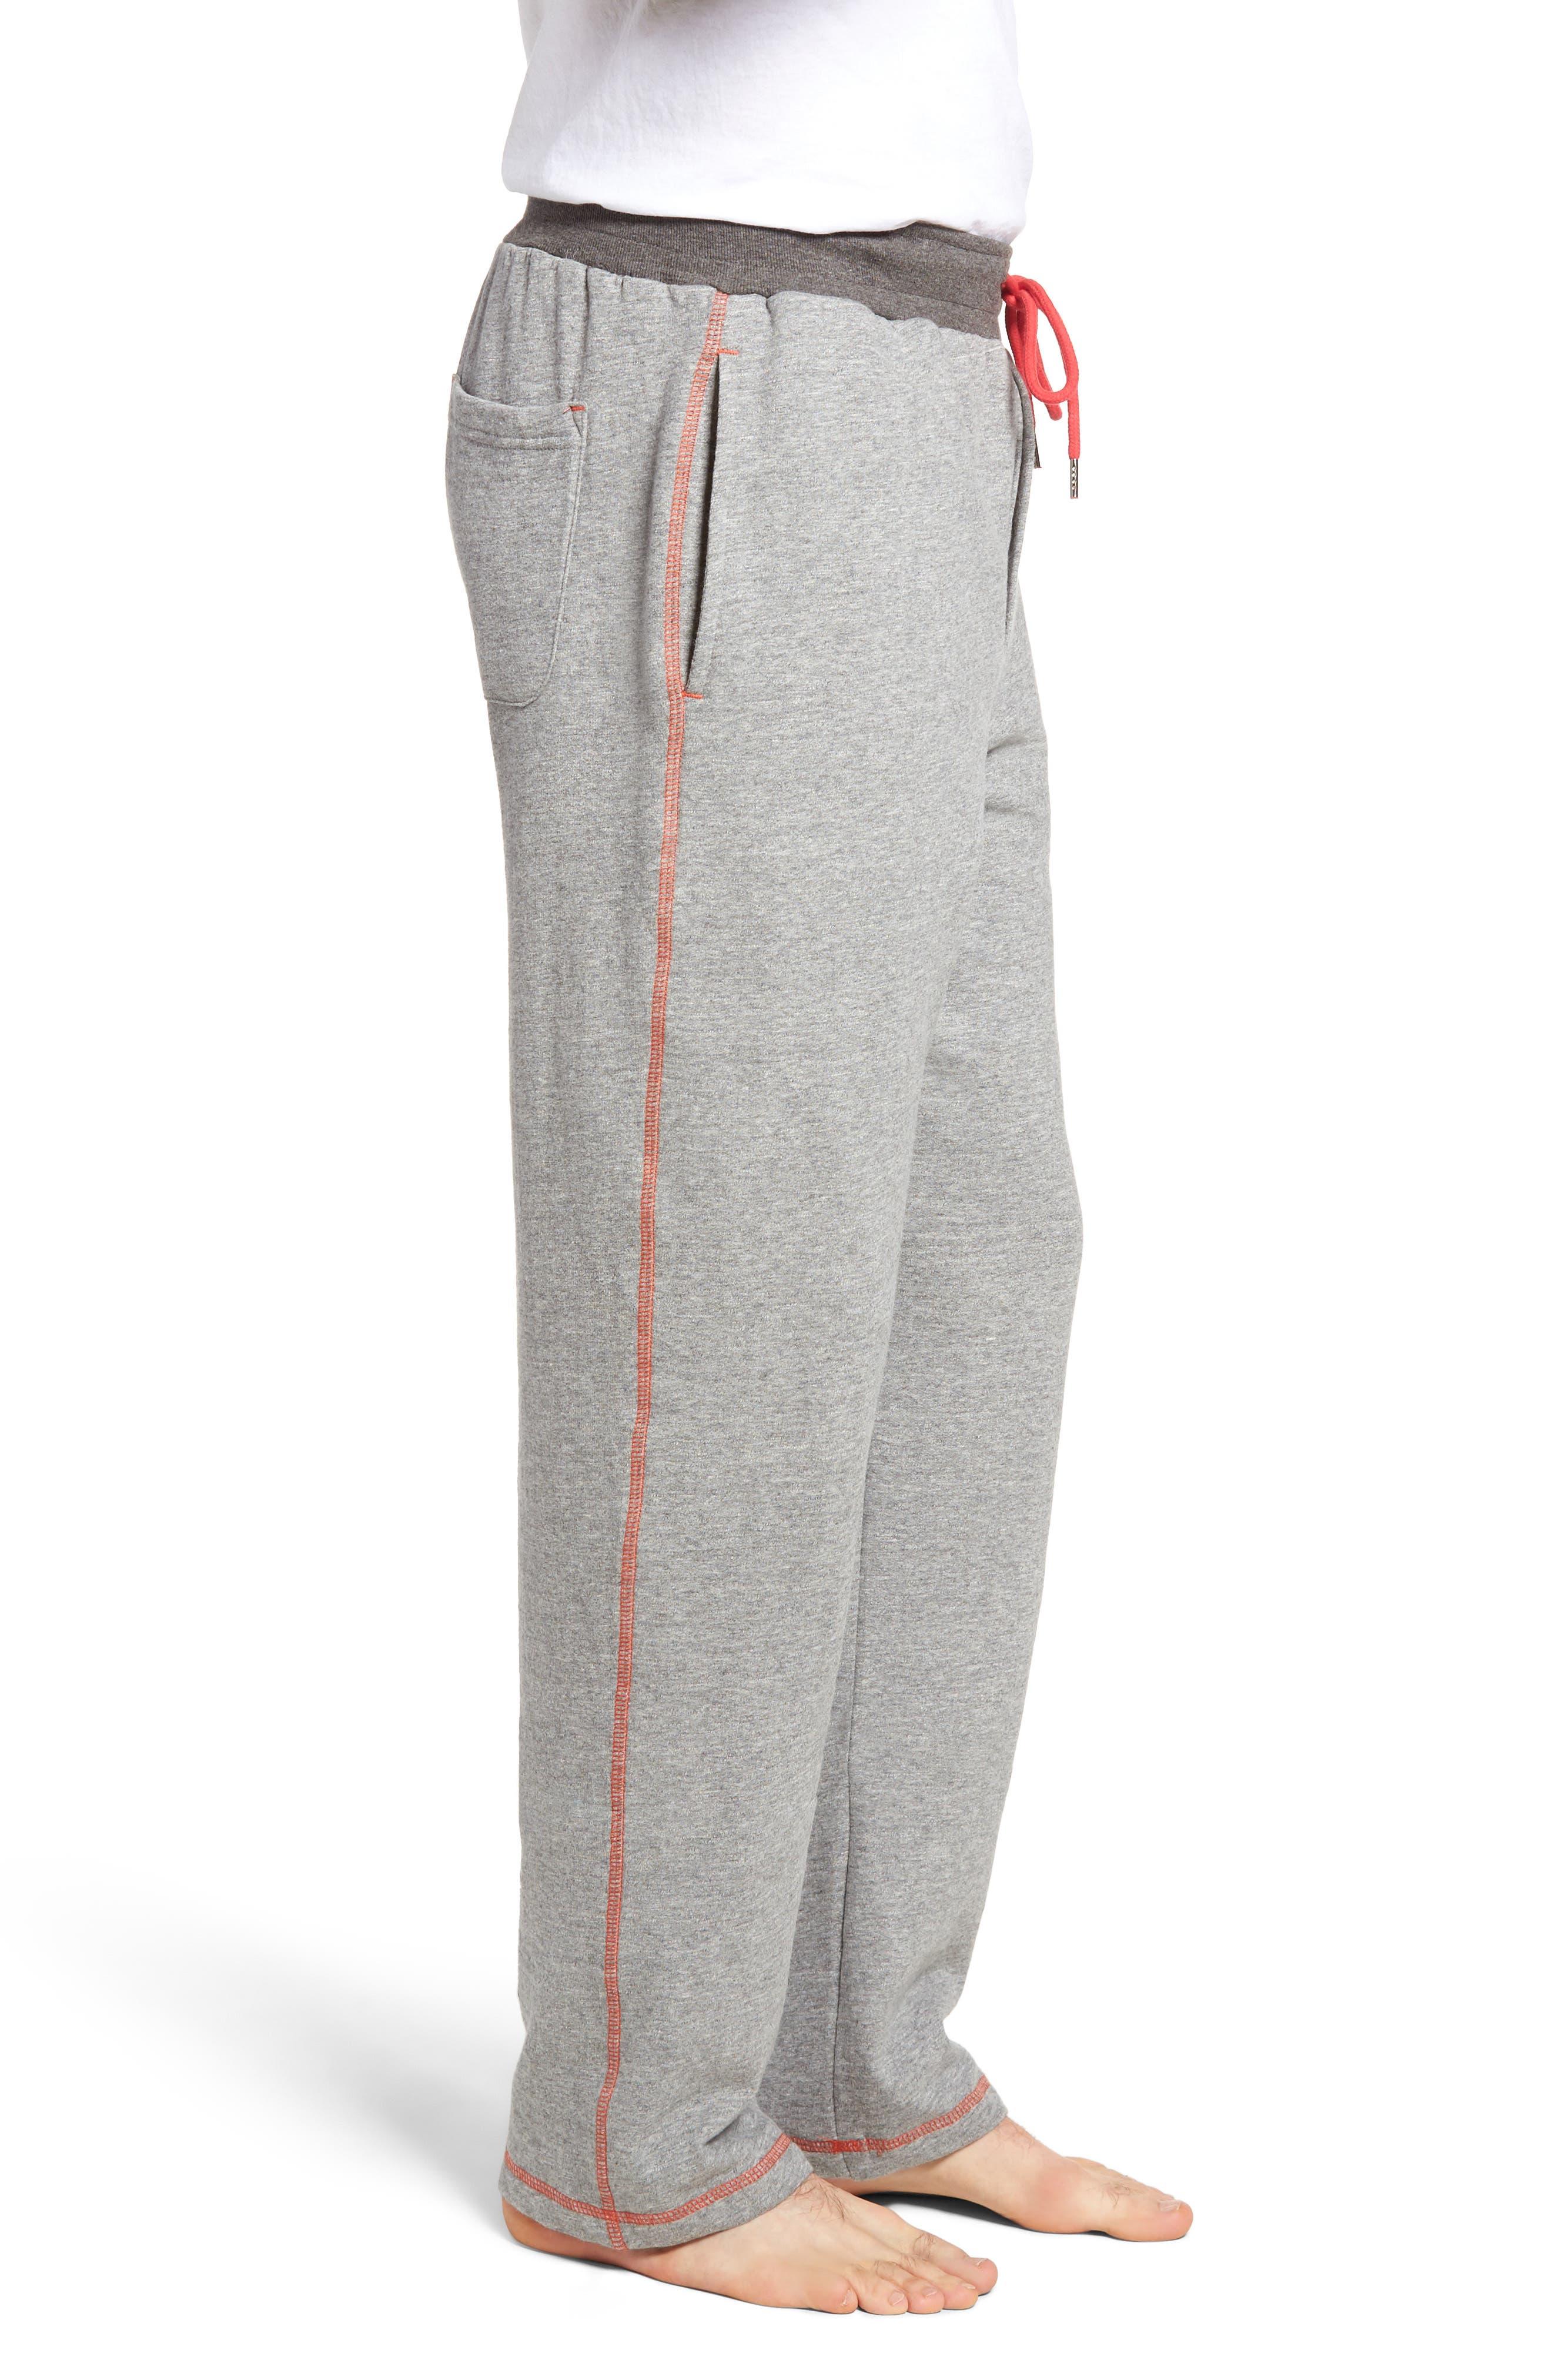 Bhooka Cotton Blend Lounge Pants,                             Alternate thumbnail 3, color,                             020